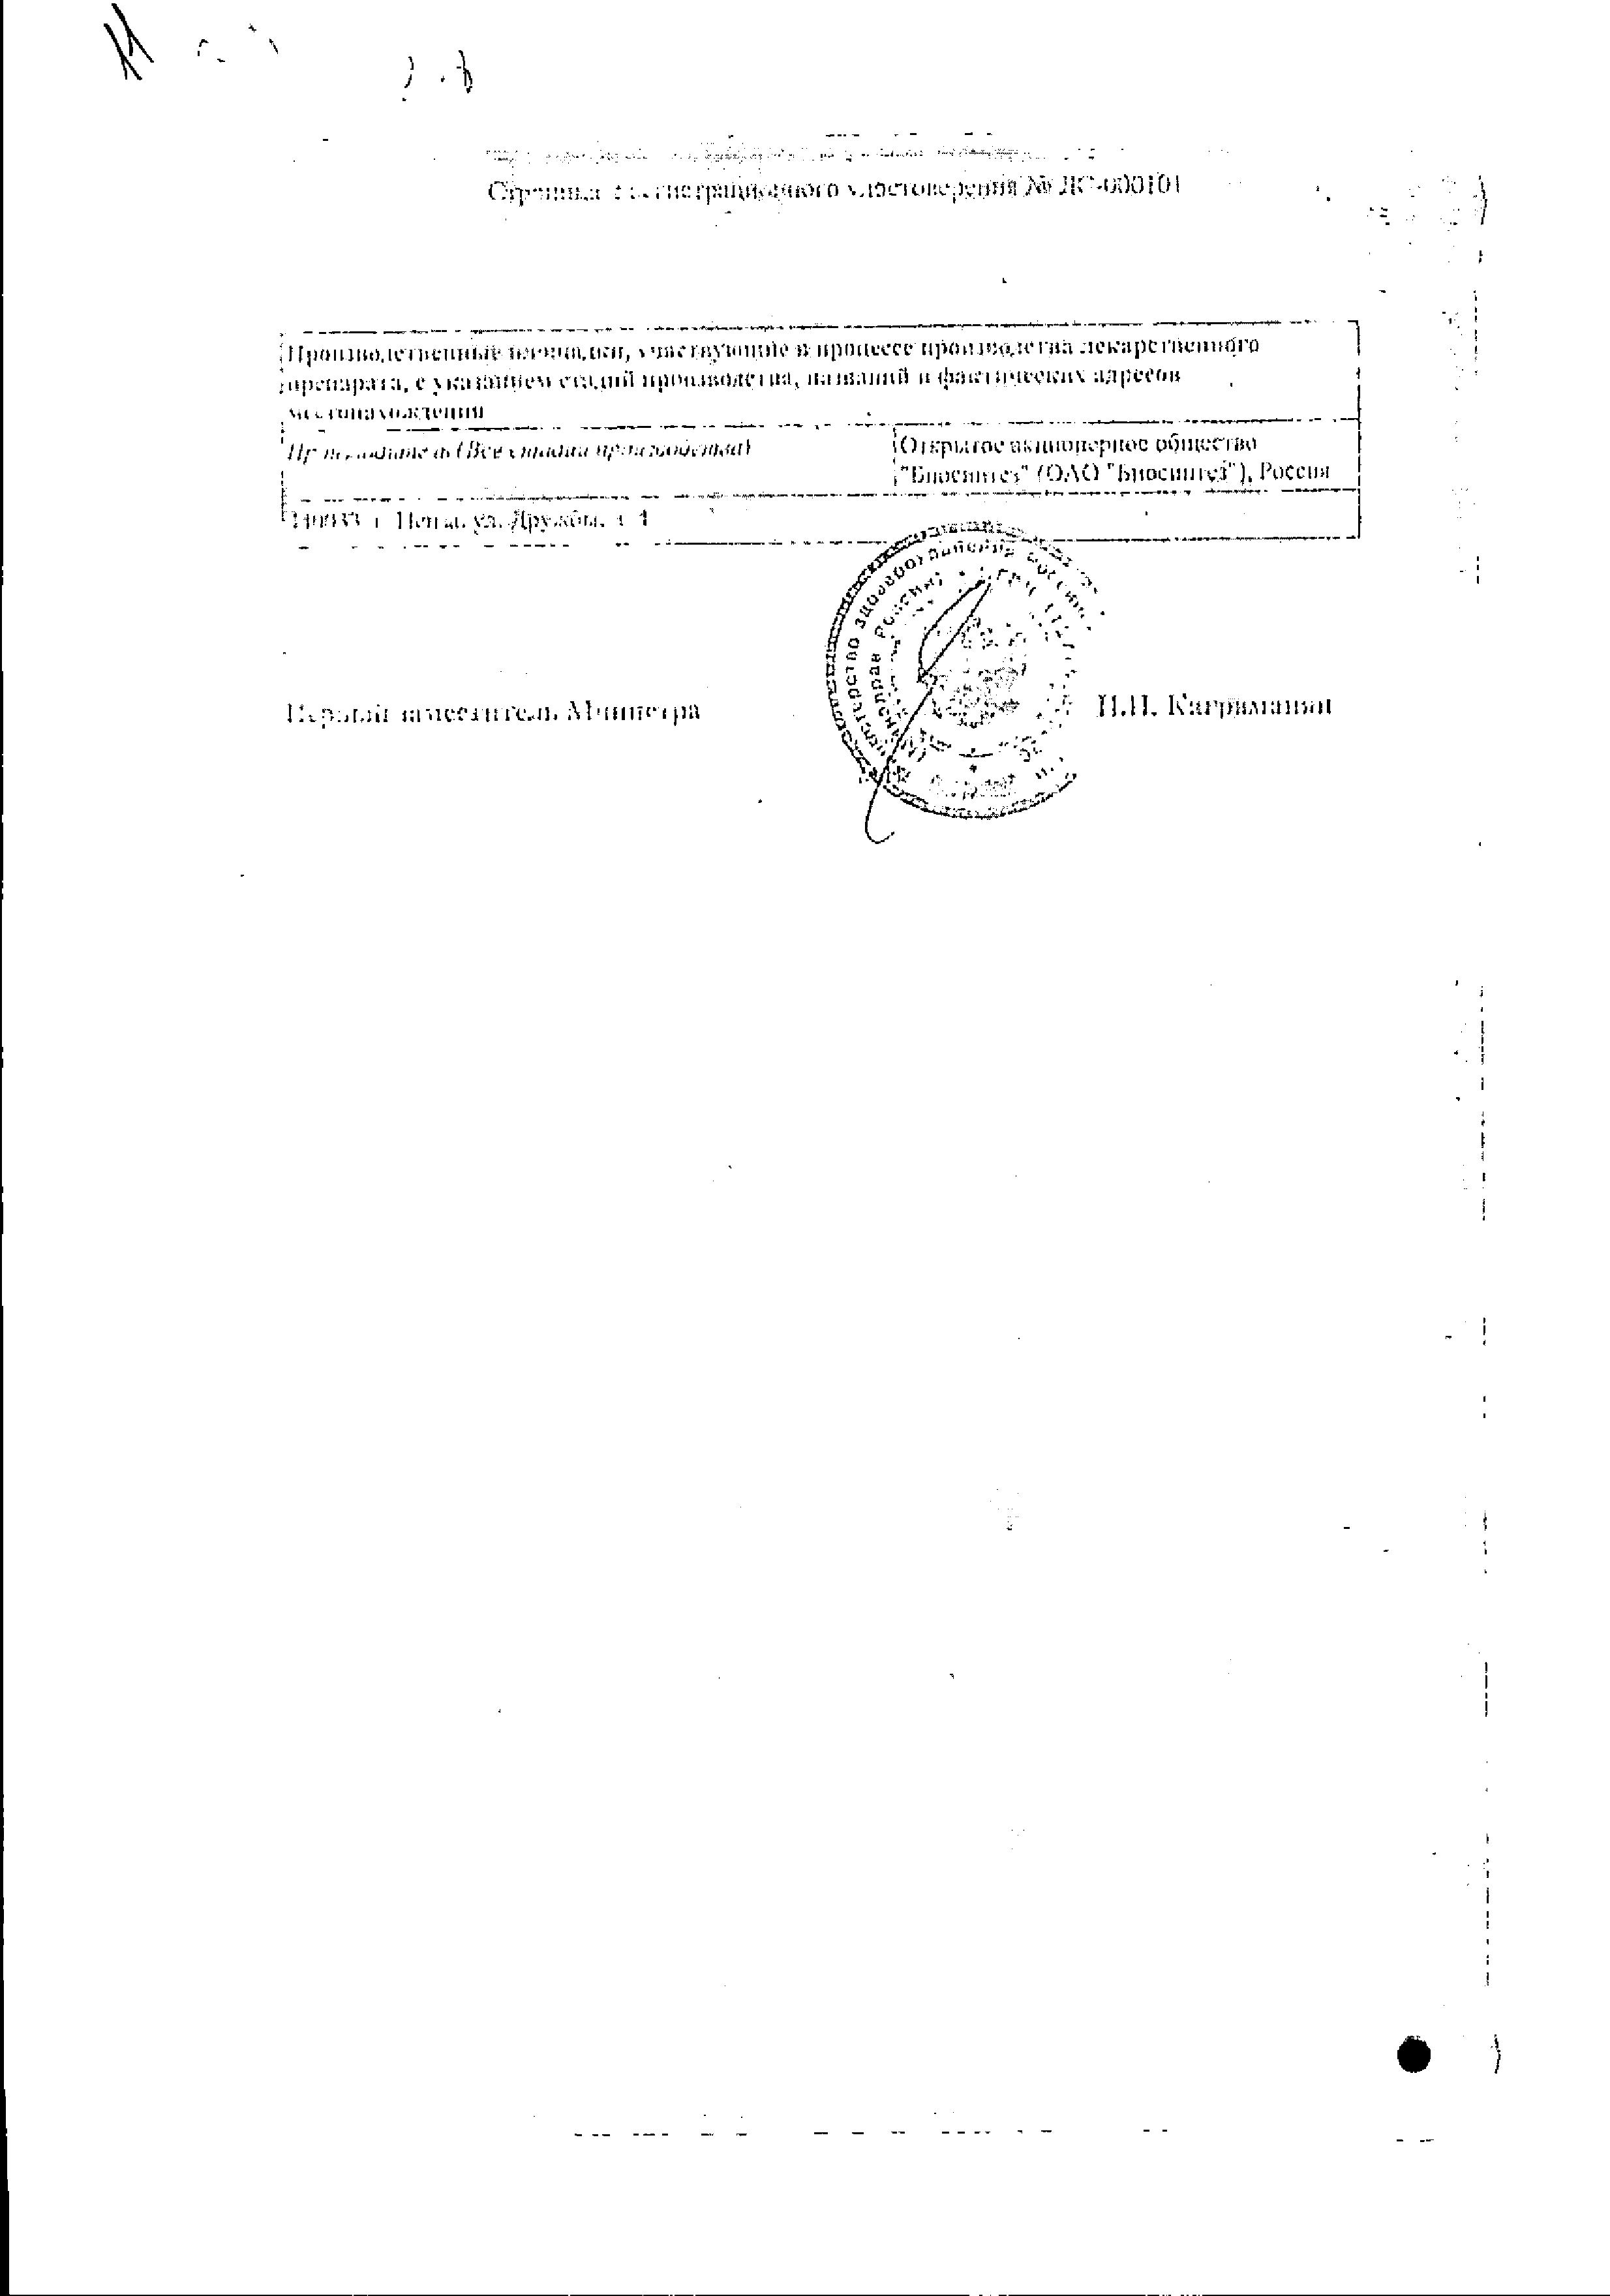 Гризеофульвин сертификат